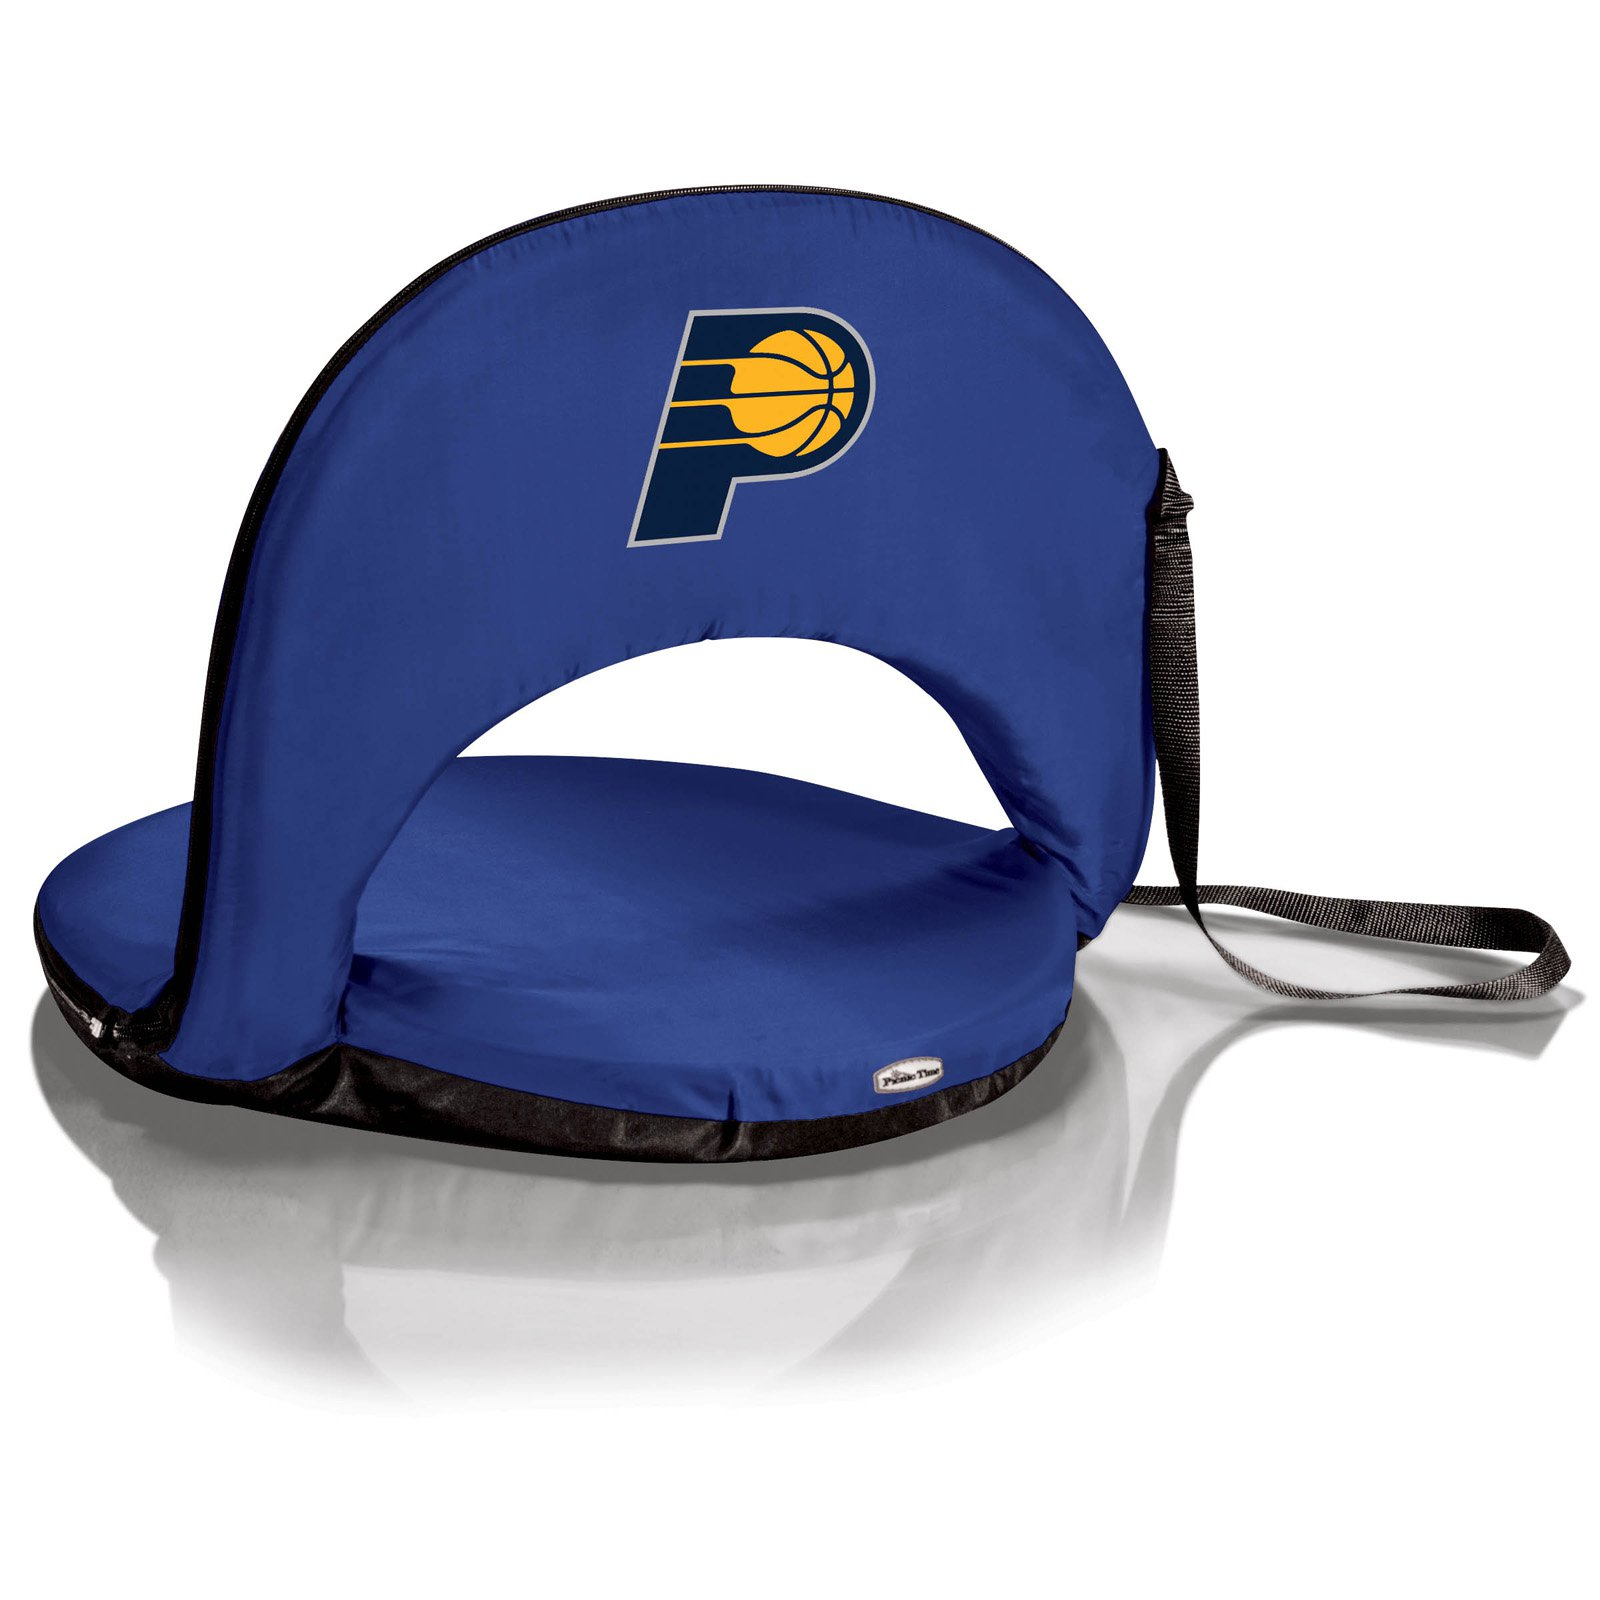 Picnic Time NBA Oniva Portable Reclining Seat